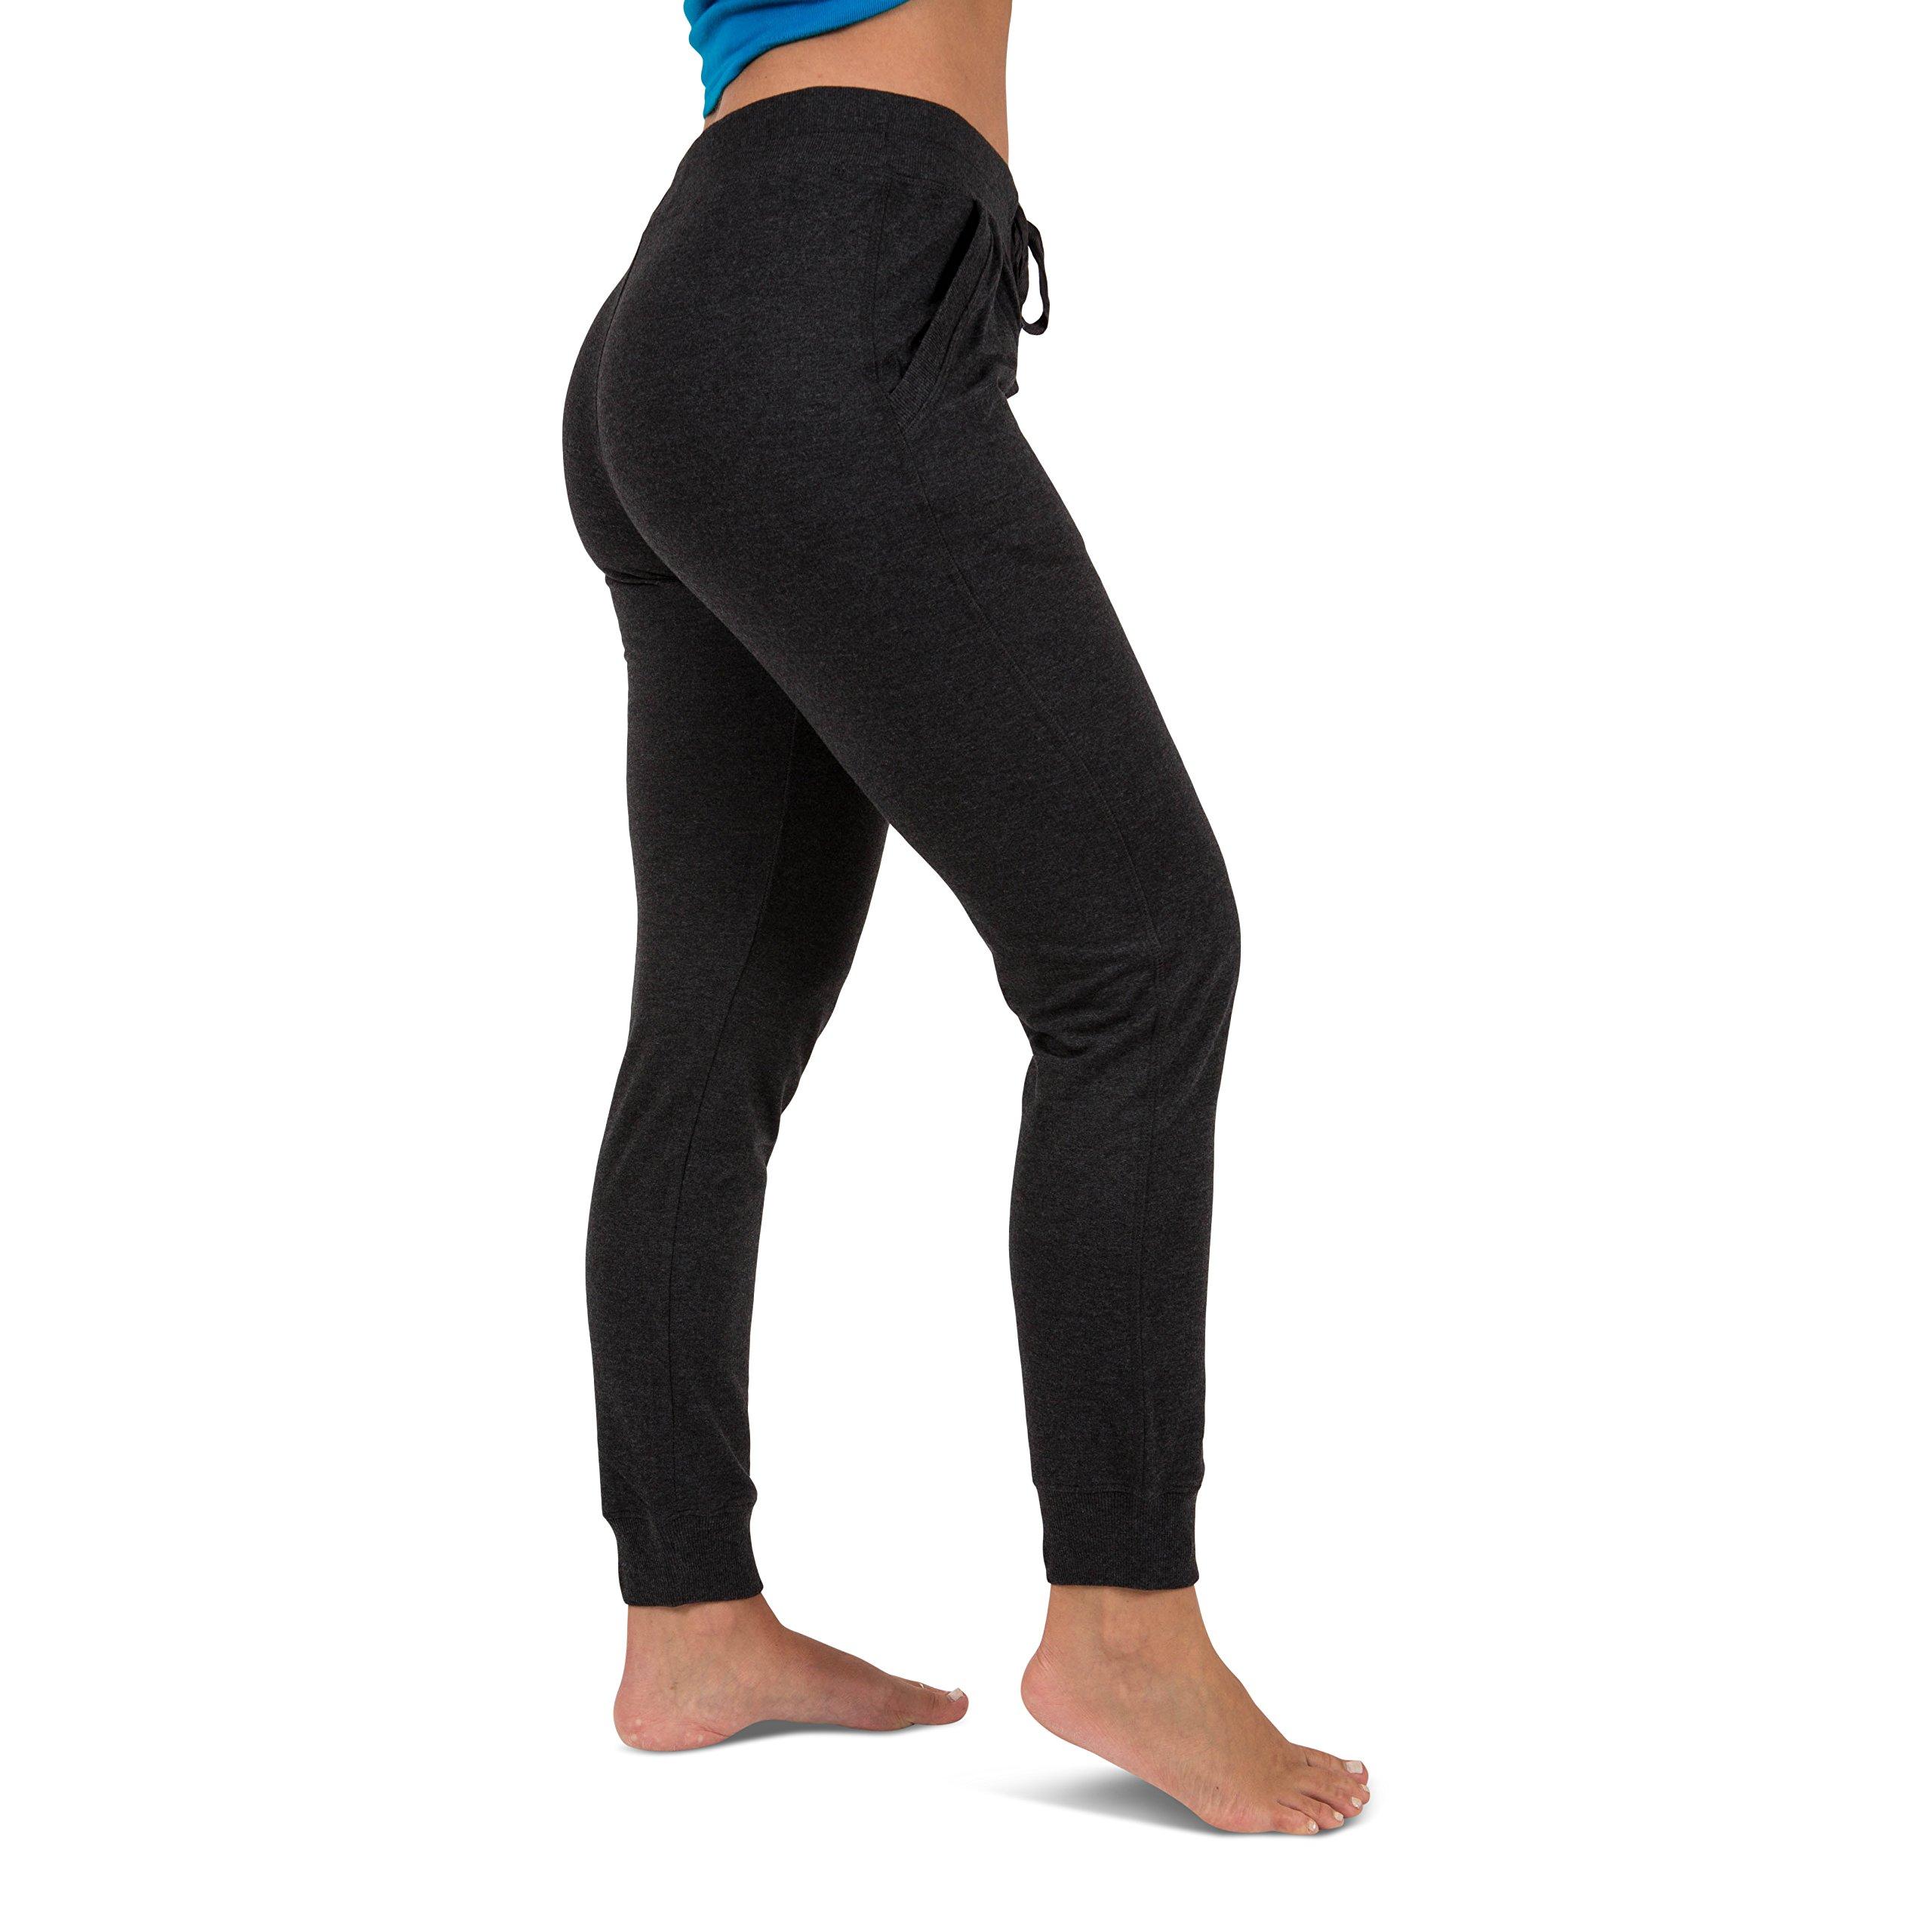 Sexy Basics Women's 2 Pack Yoga Activewear Jogger Capri Cropped Sweat Lounge Pants (2 Pack- Navy/Charcoal, Large) by Sexy Basics (Image #2)